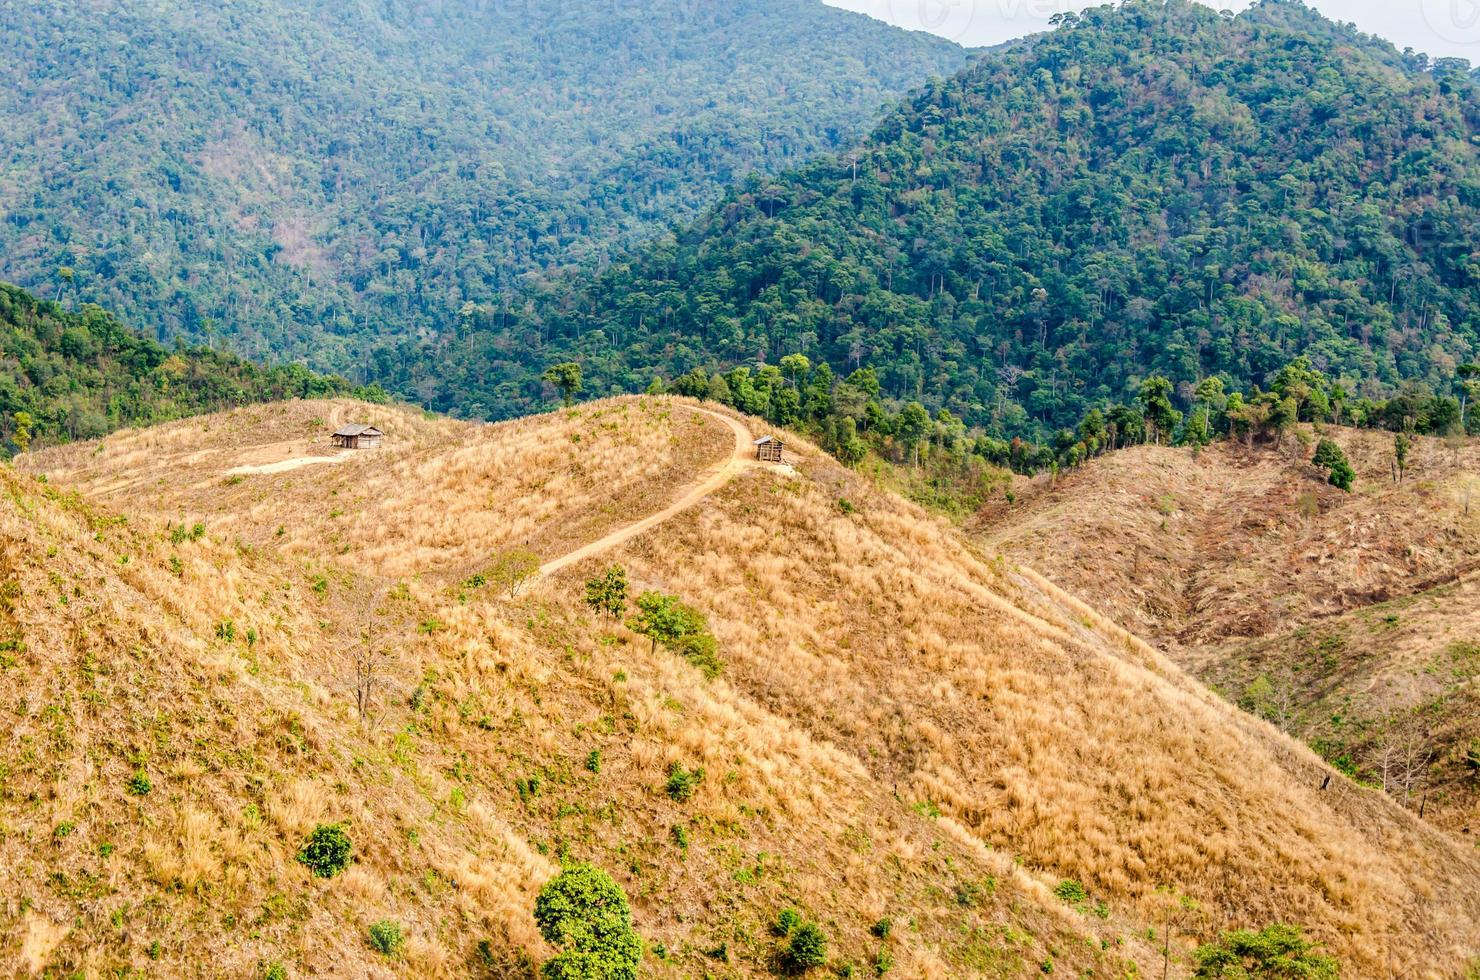 gedegradeerd bos op berg in thailand foto